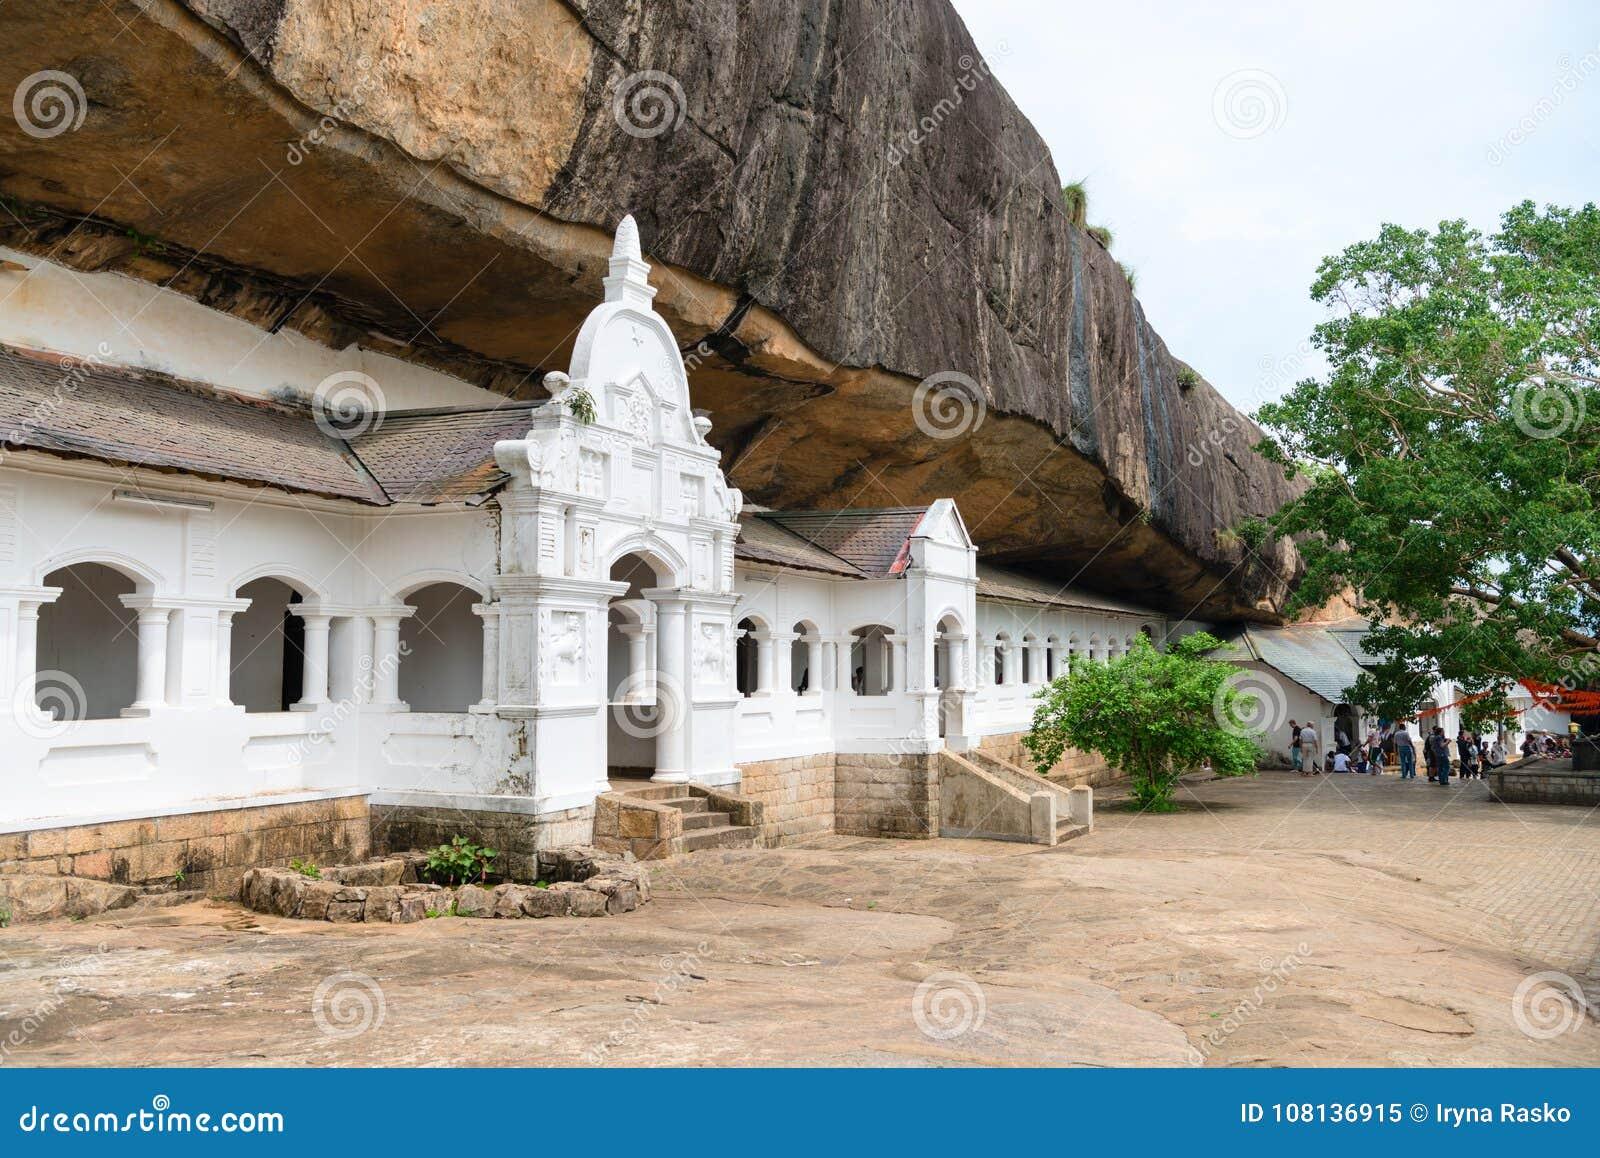 Dambulla golden temple cave complex buildinds is destination for